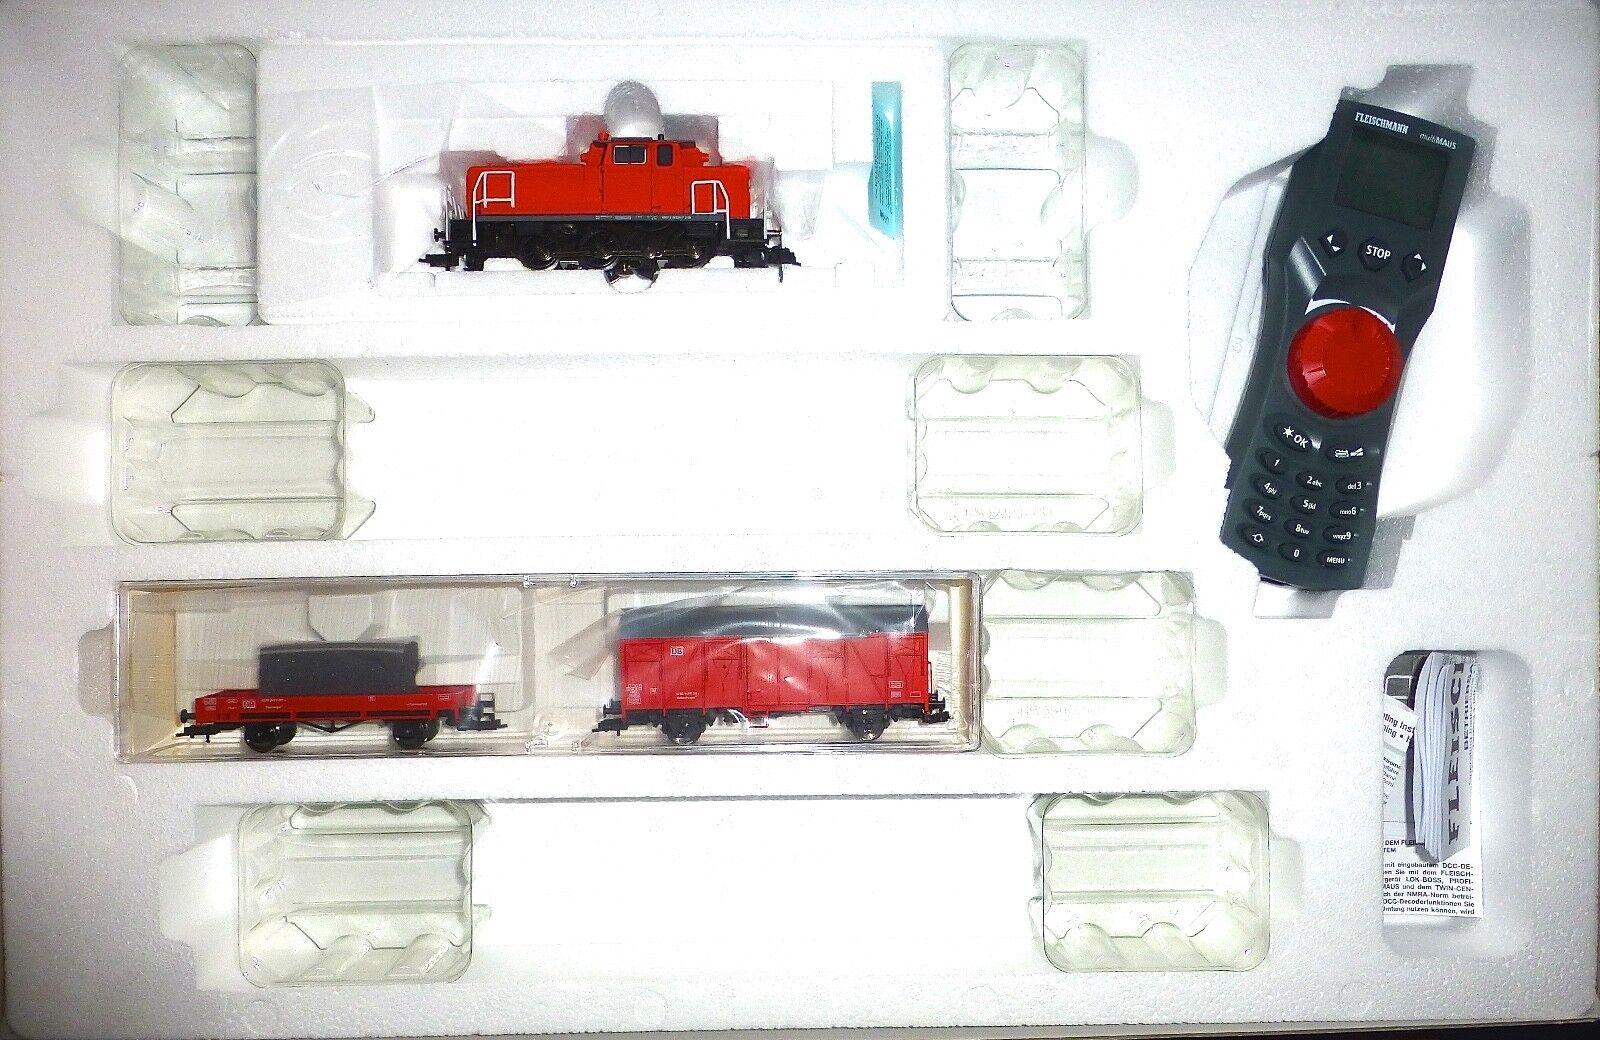 Treno +2 vagoni Multi mouse Fleischmann DIGITAL start set 631282 h0 1:87 µ *